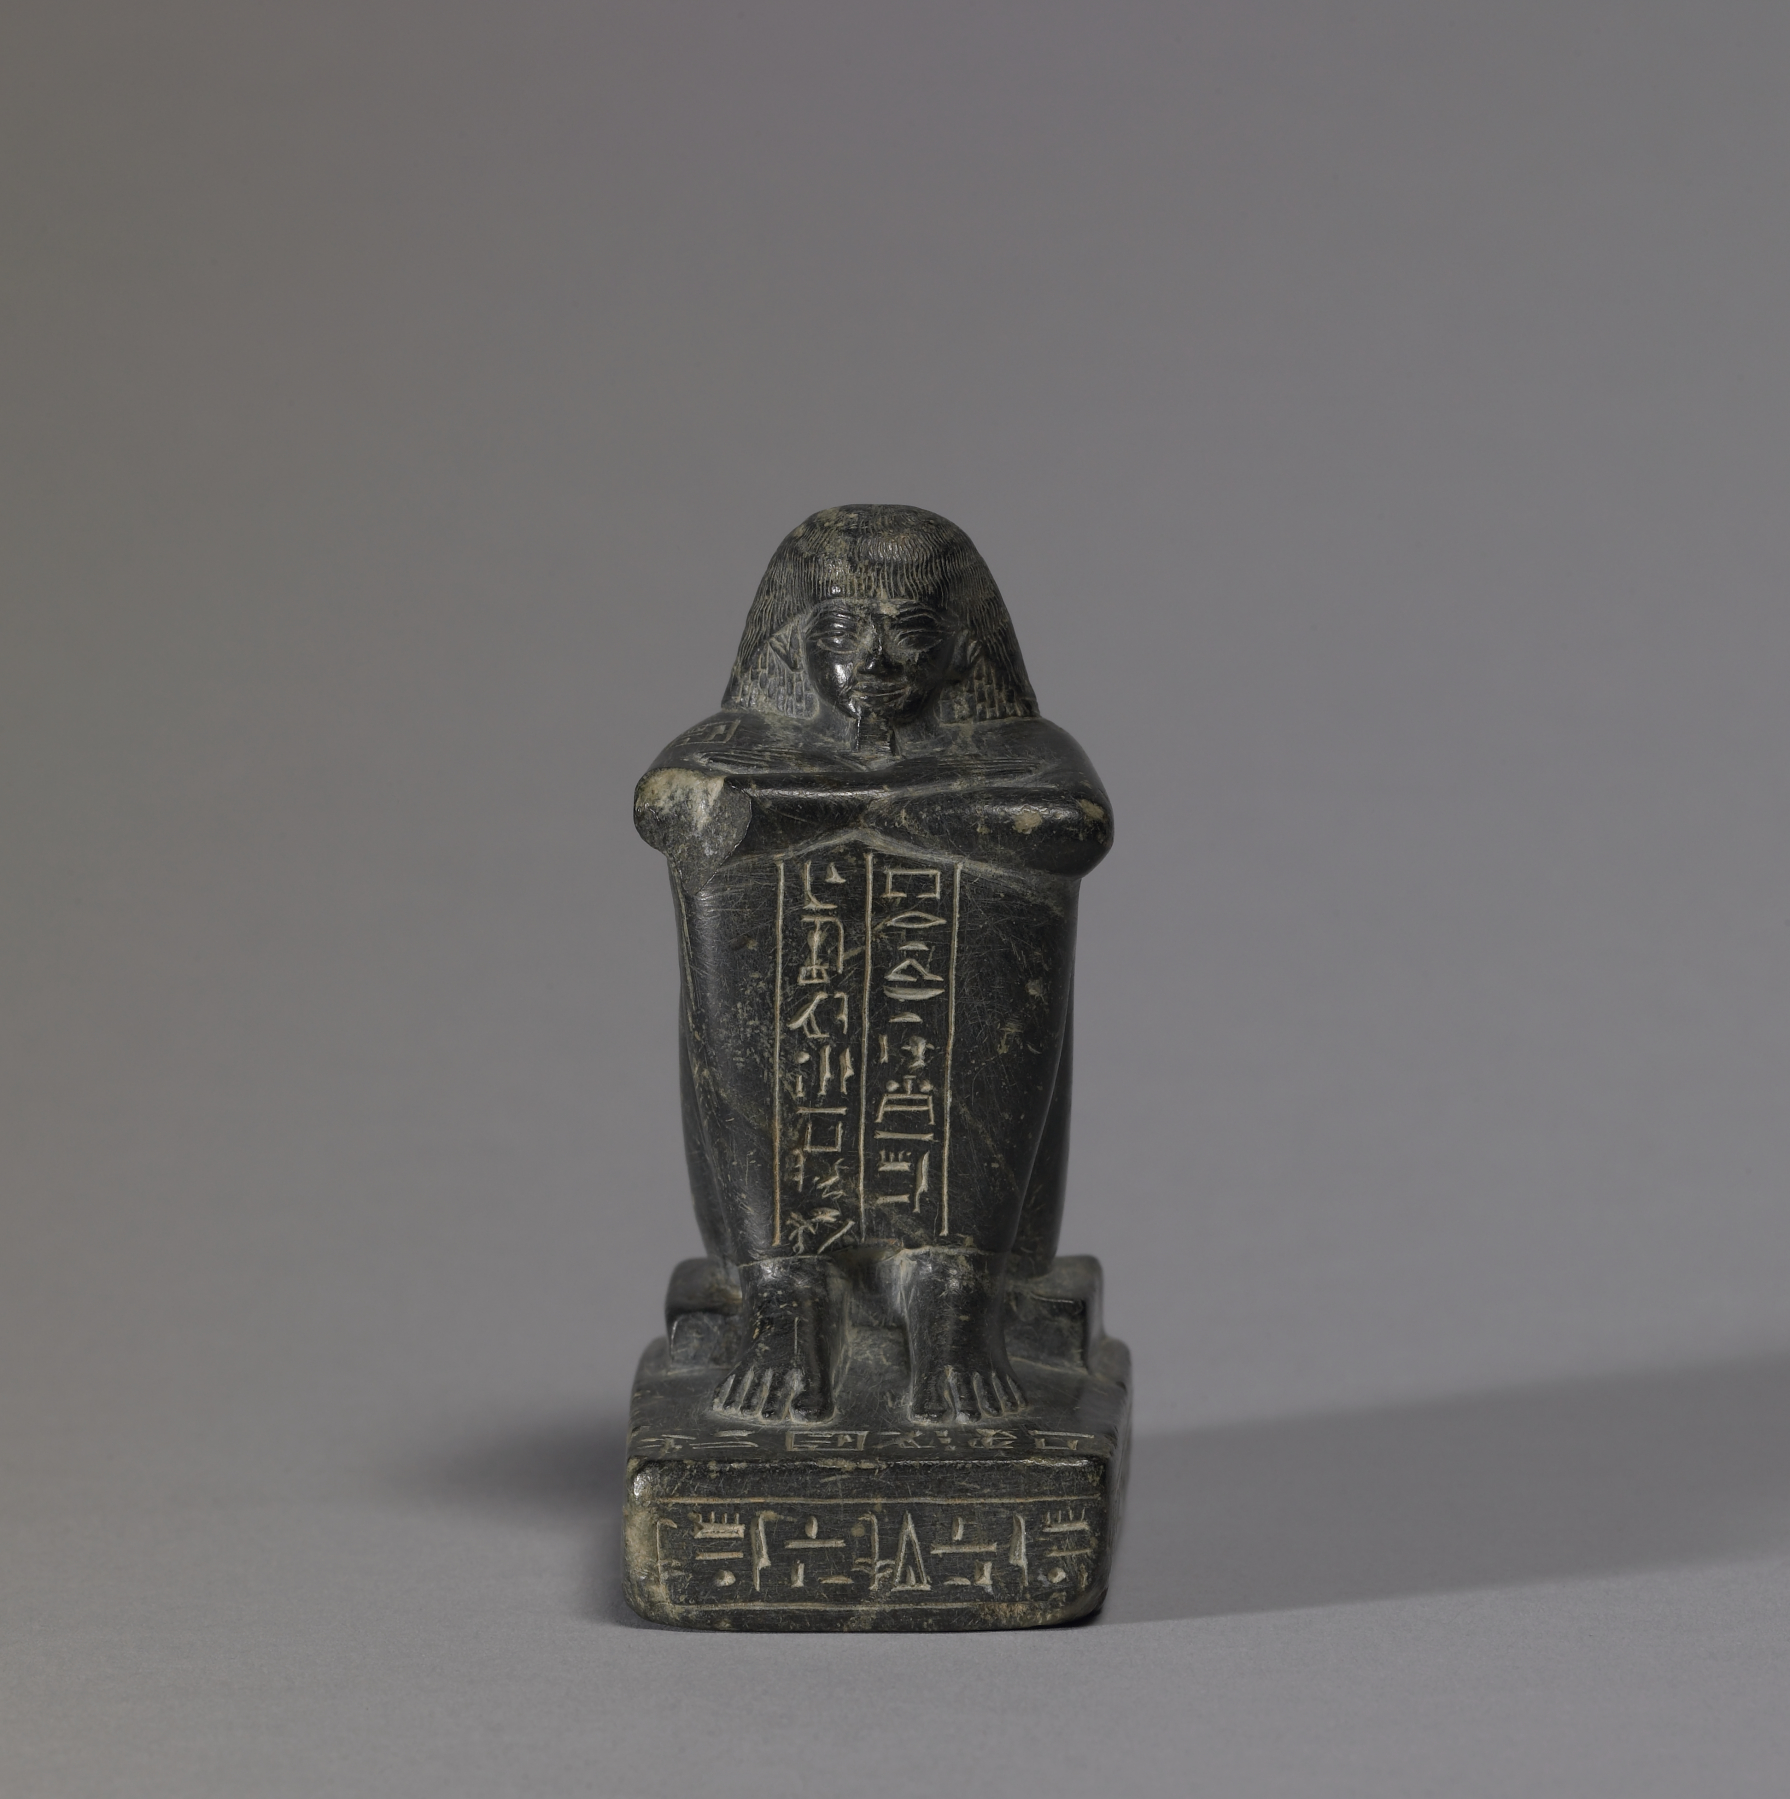 Egyptian_-_Block_Statue_of_Kha-em-Waset_-_Walters_2268.jpg